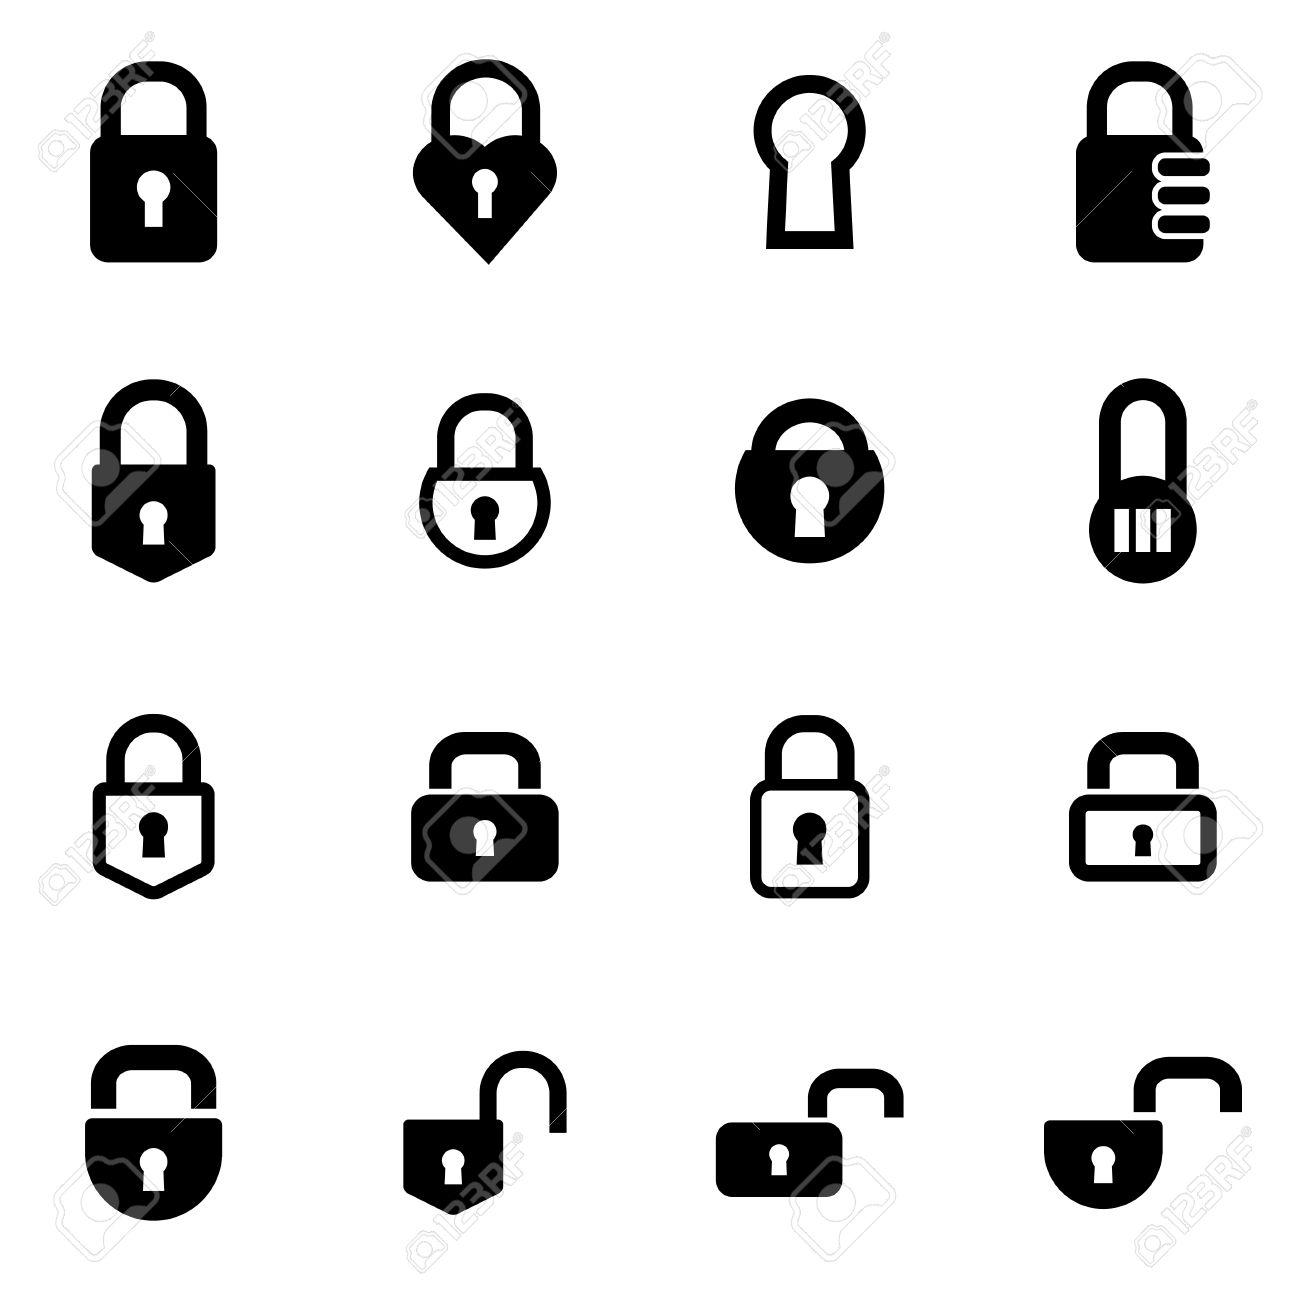 Vector black locks icon set on white background - 42715871